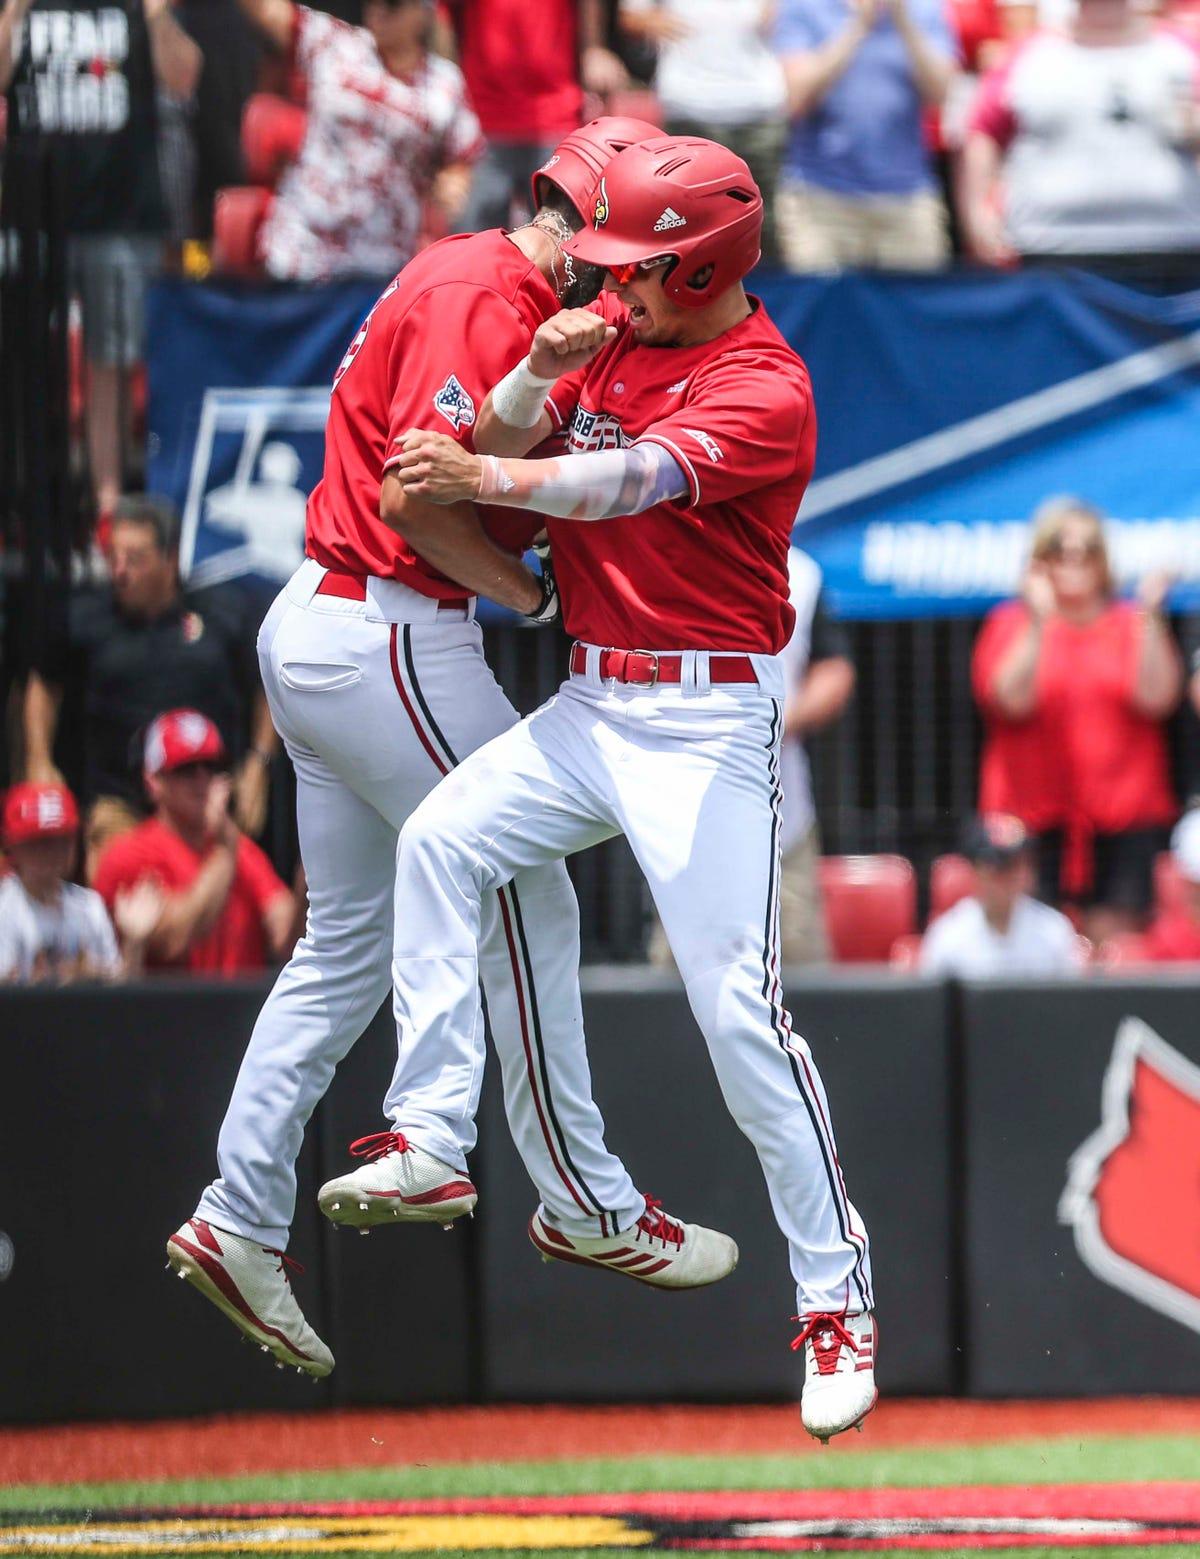 Louisville baseball: U of L sweeps East Carolina, advances